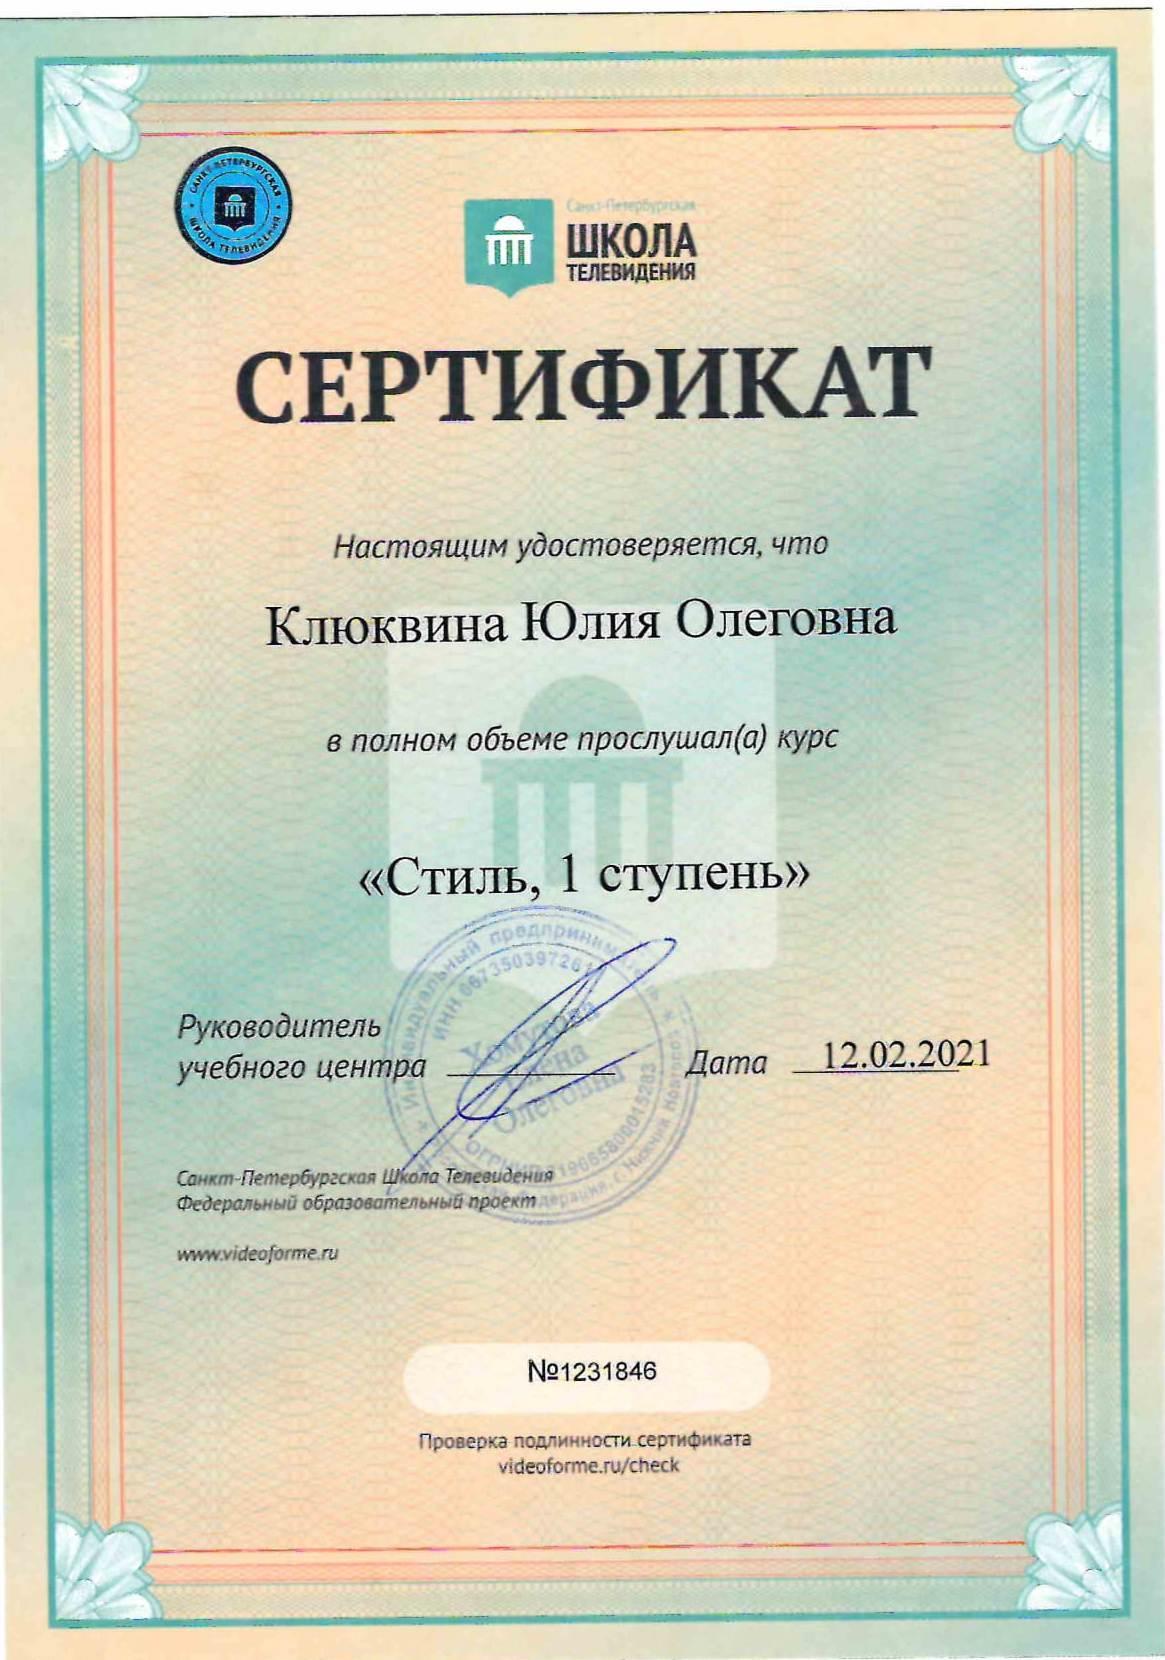 сертификат клюквина